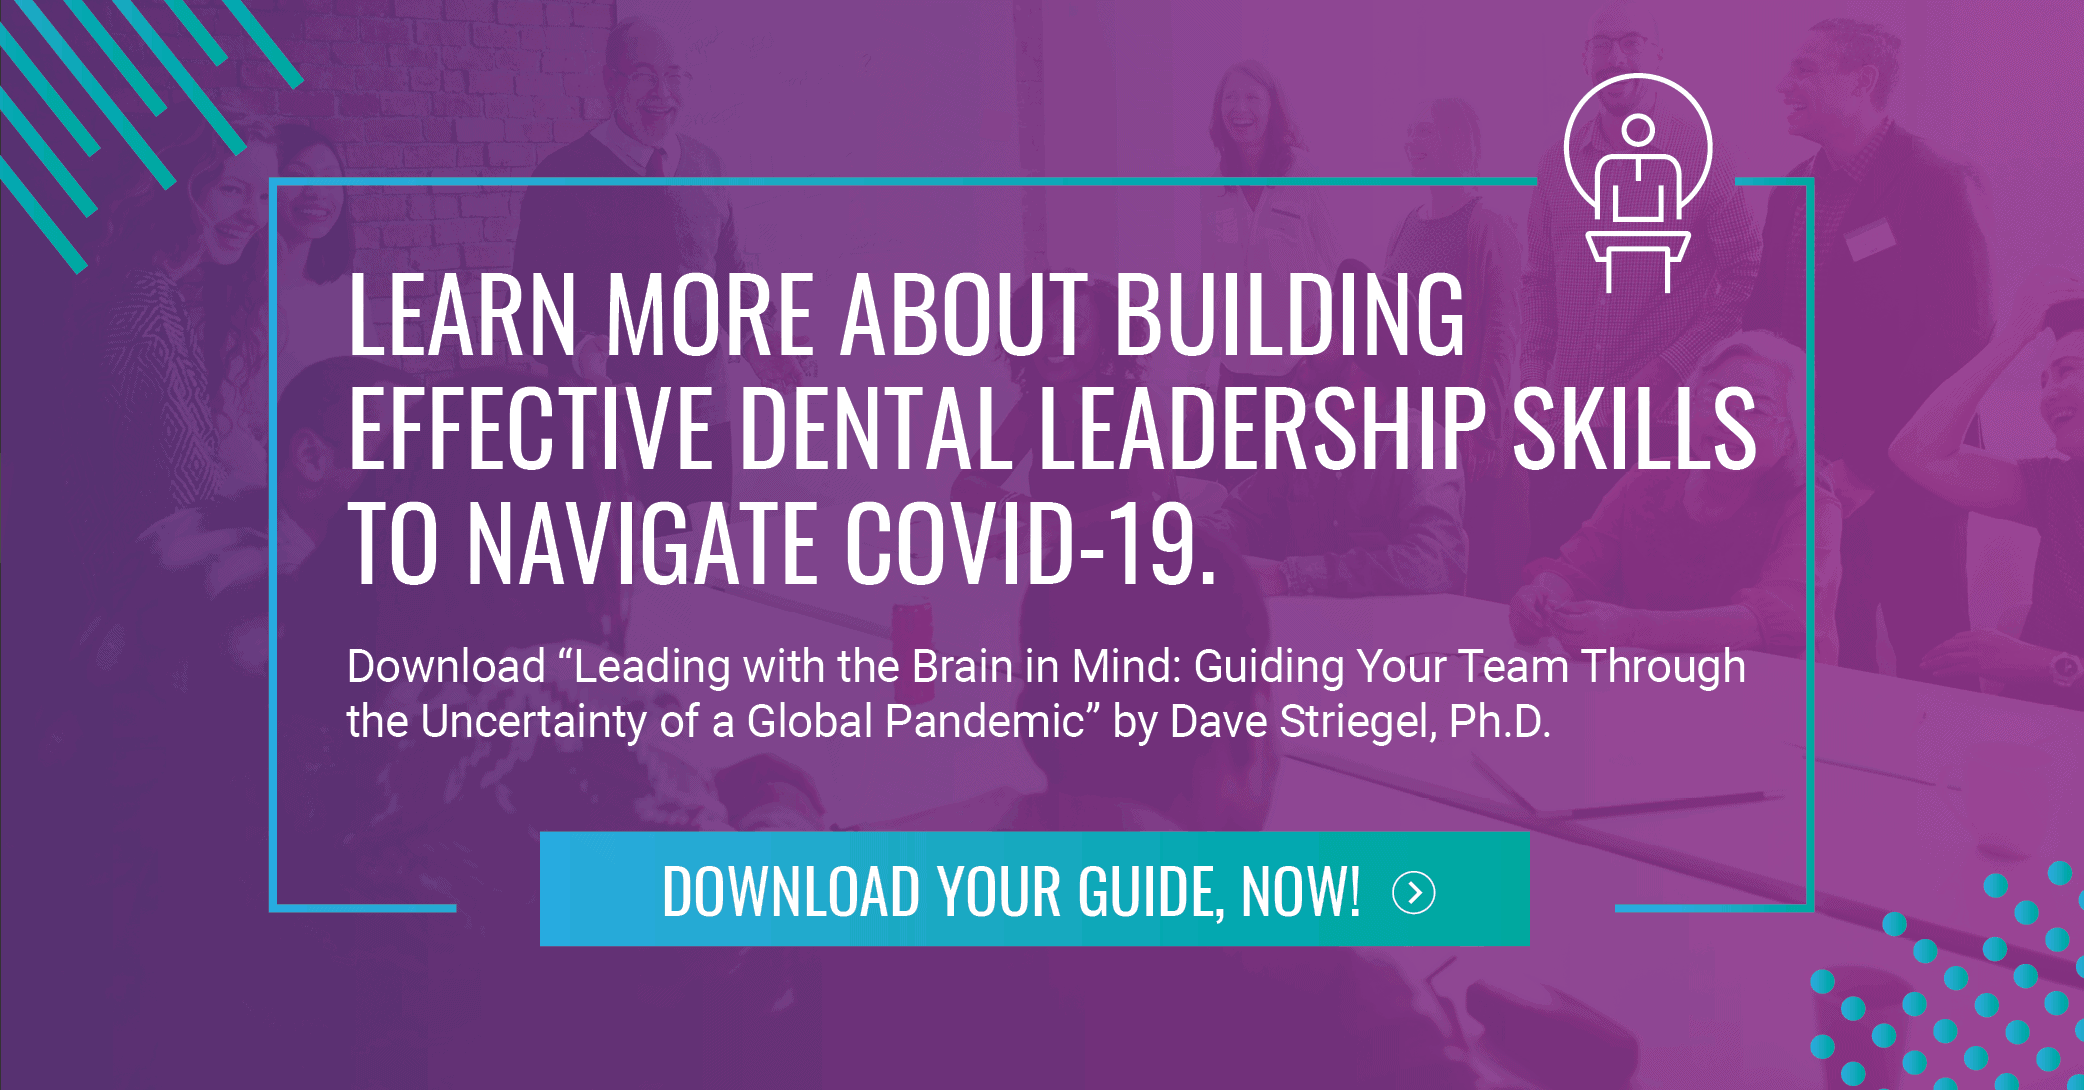 Dental leadership